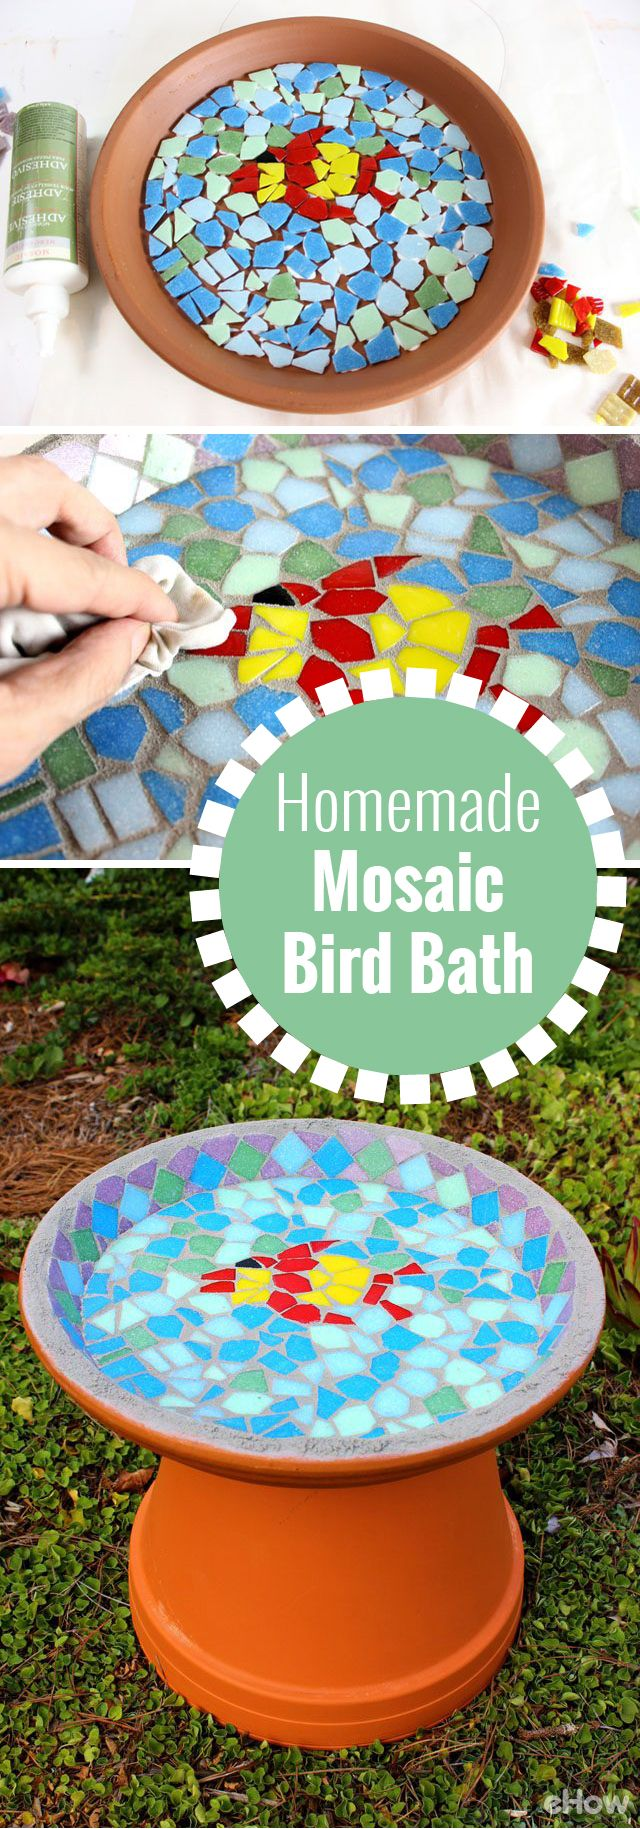 DIY your own mosaic bird bath!  DIY instructions here: http://www.ehow.com/way_5199803_homemade-bird-bath.html?utm_source=pinterest.com&utm_medium=referral&utm_content=freestyle&utm_campaign=fanpage